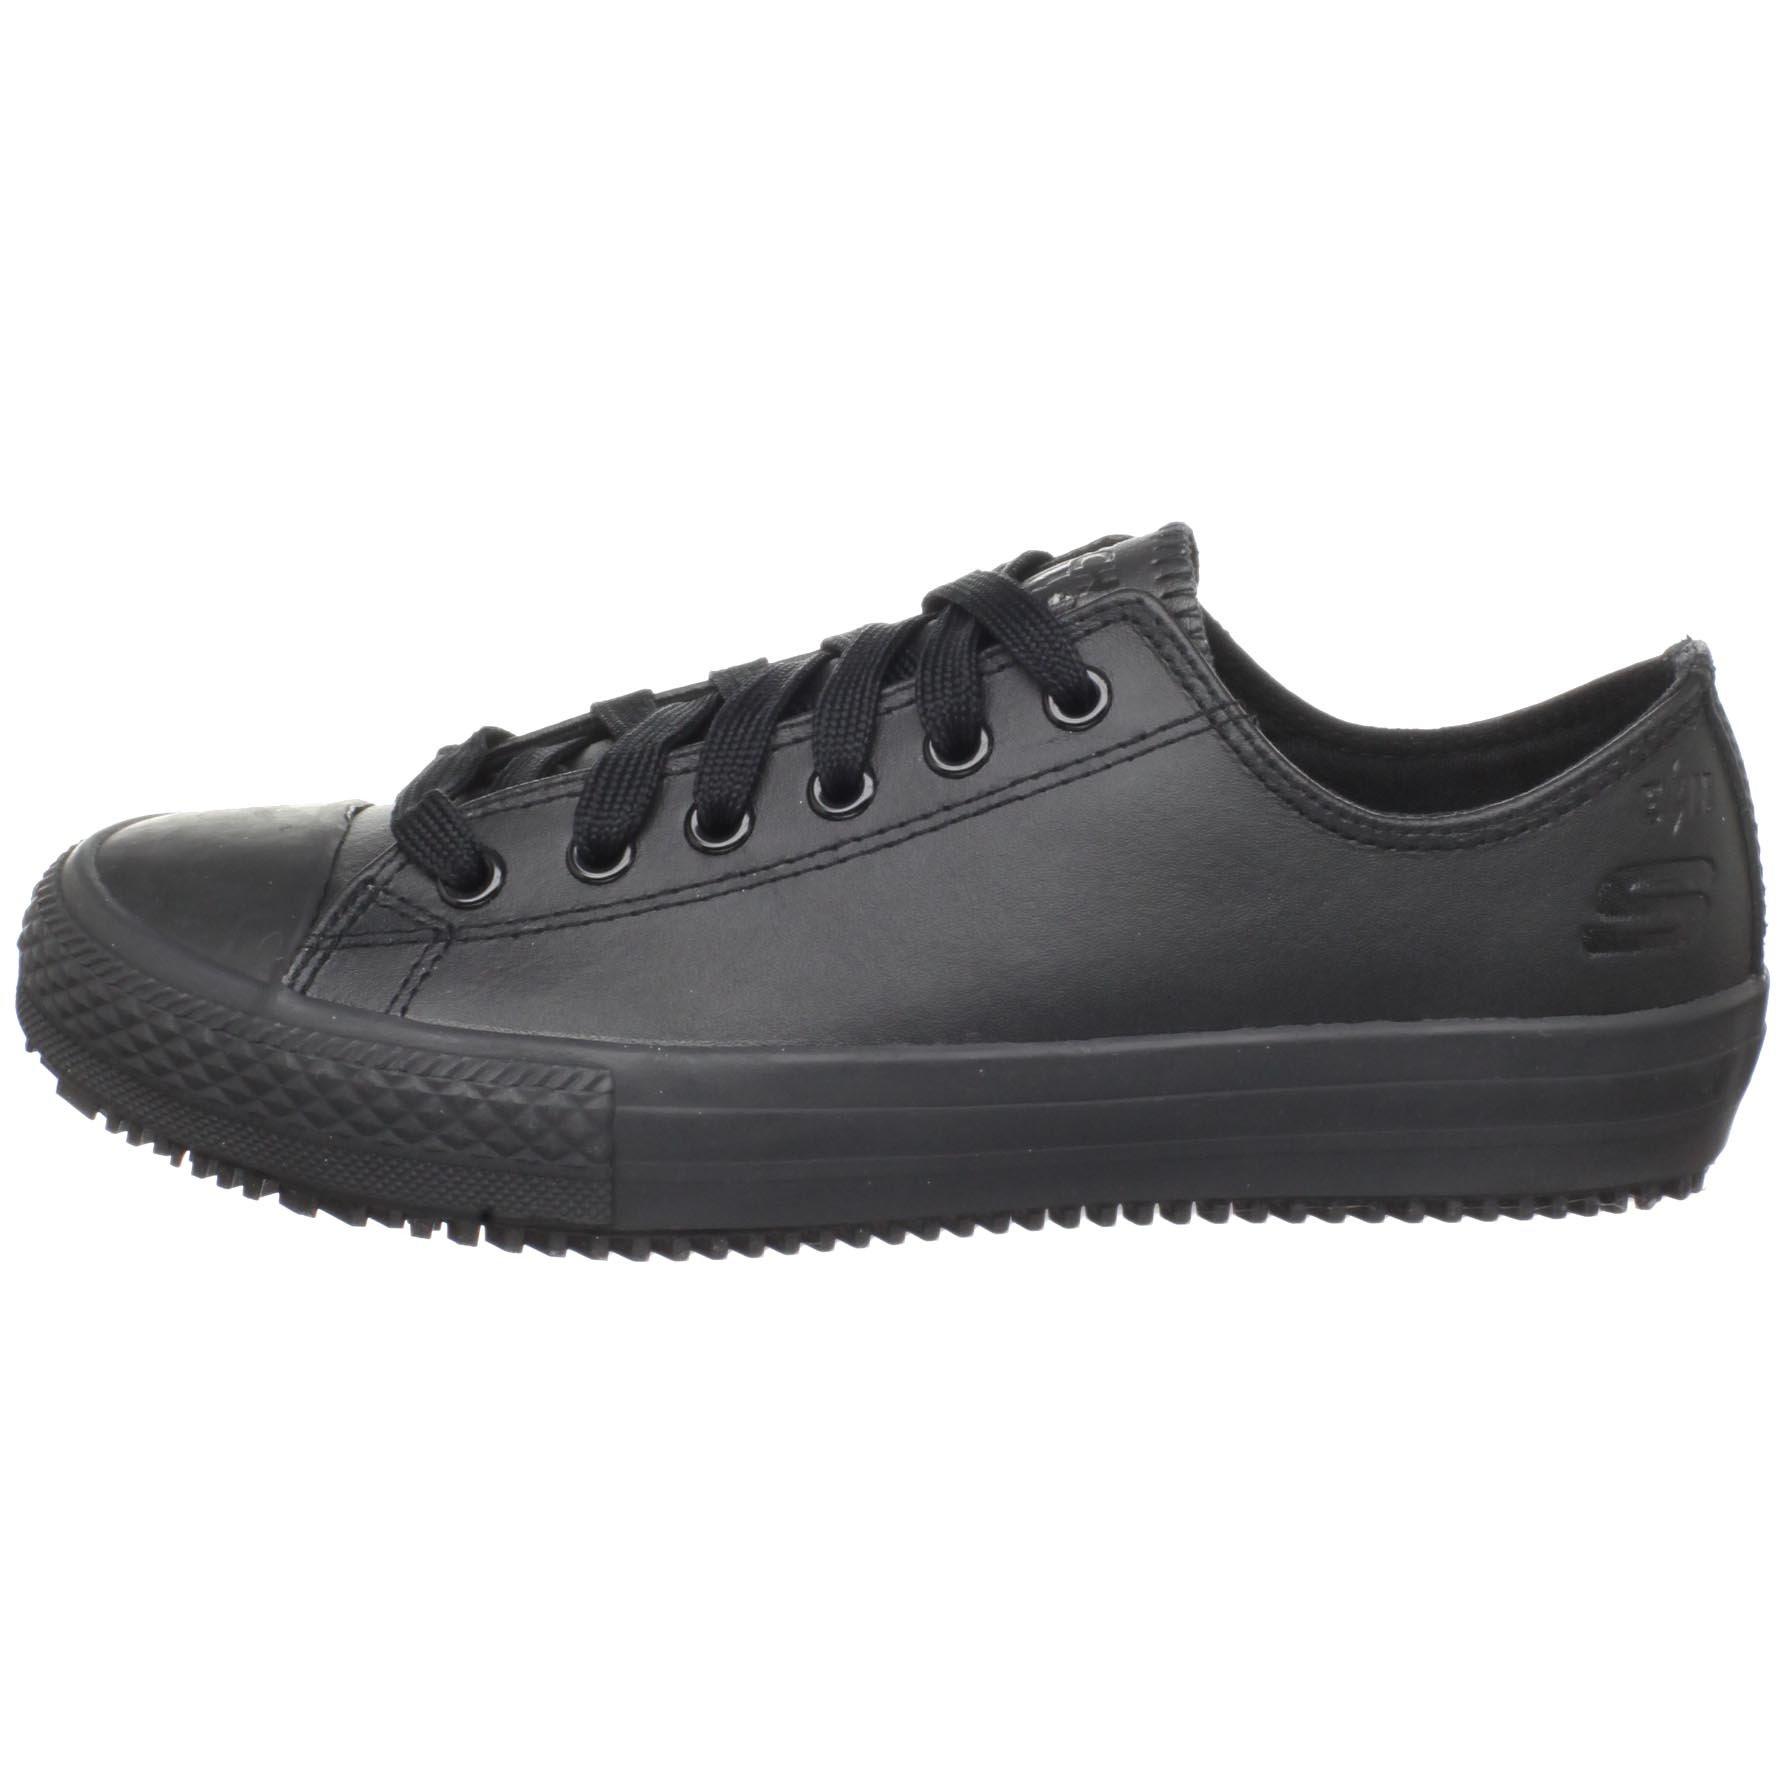 Skechers for Work Women's Gibson-Hardwood Slip-Resistant Sneaker, Black, 8 M US by Skechers (Image #5)